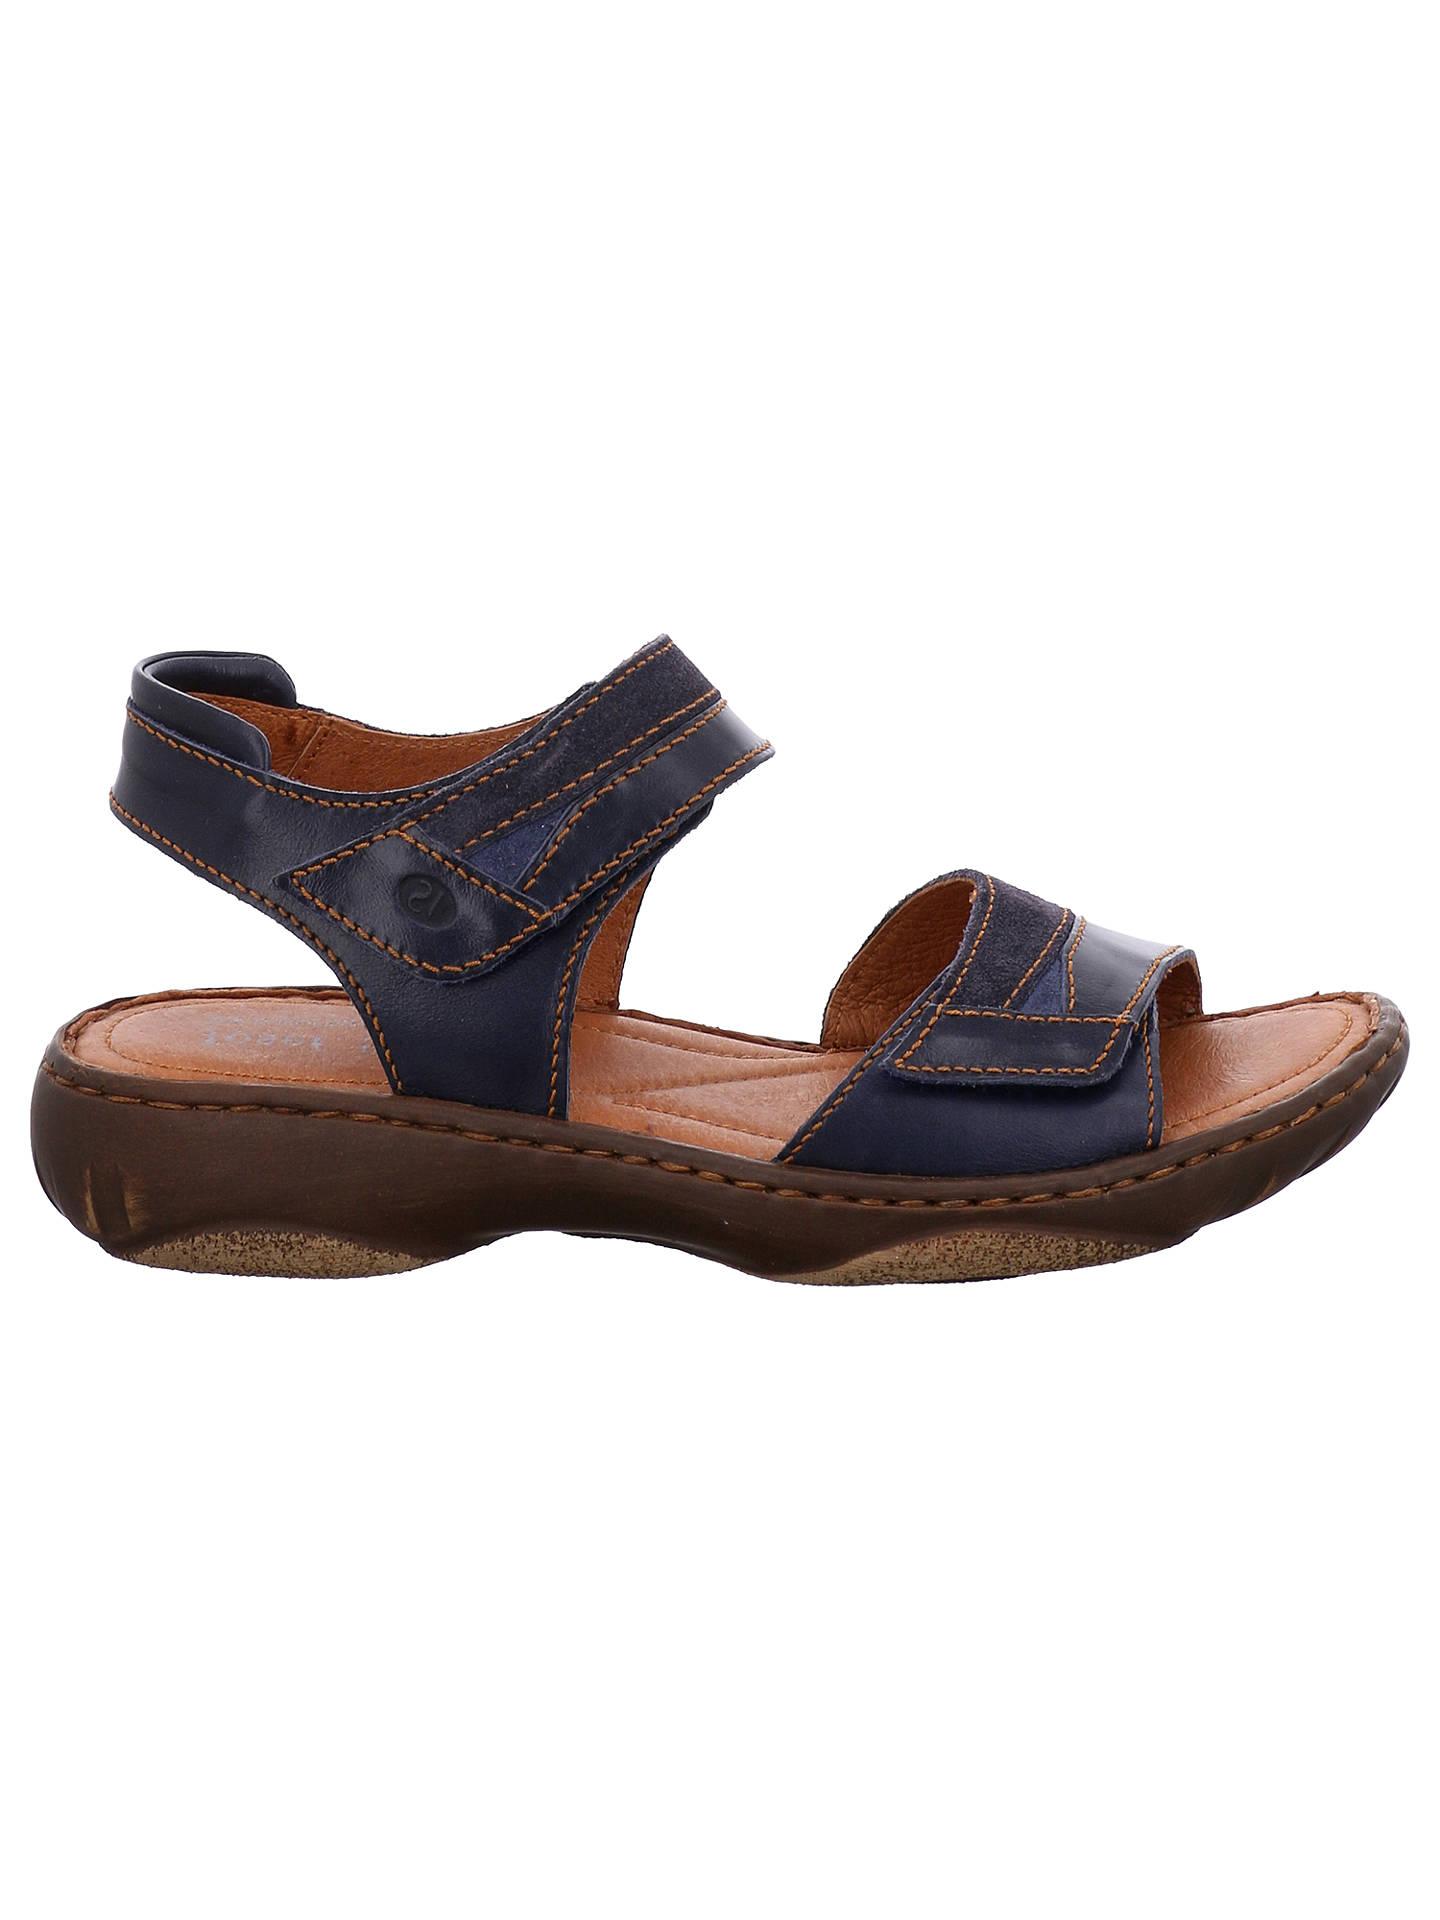 Josef Seibel Debra 19 Rip Tape Flat Sandals At John Lewis Partners Tendencies Footbed 2 Strap Brown 42 Buyjosef Denim Blue Leather 3 Online